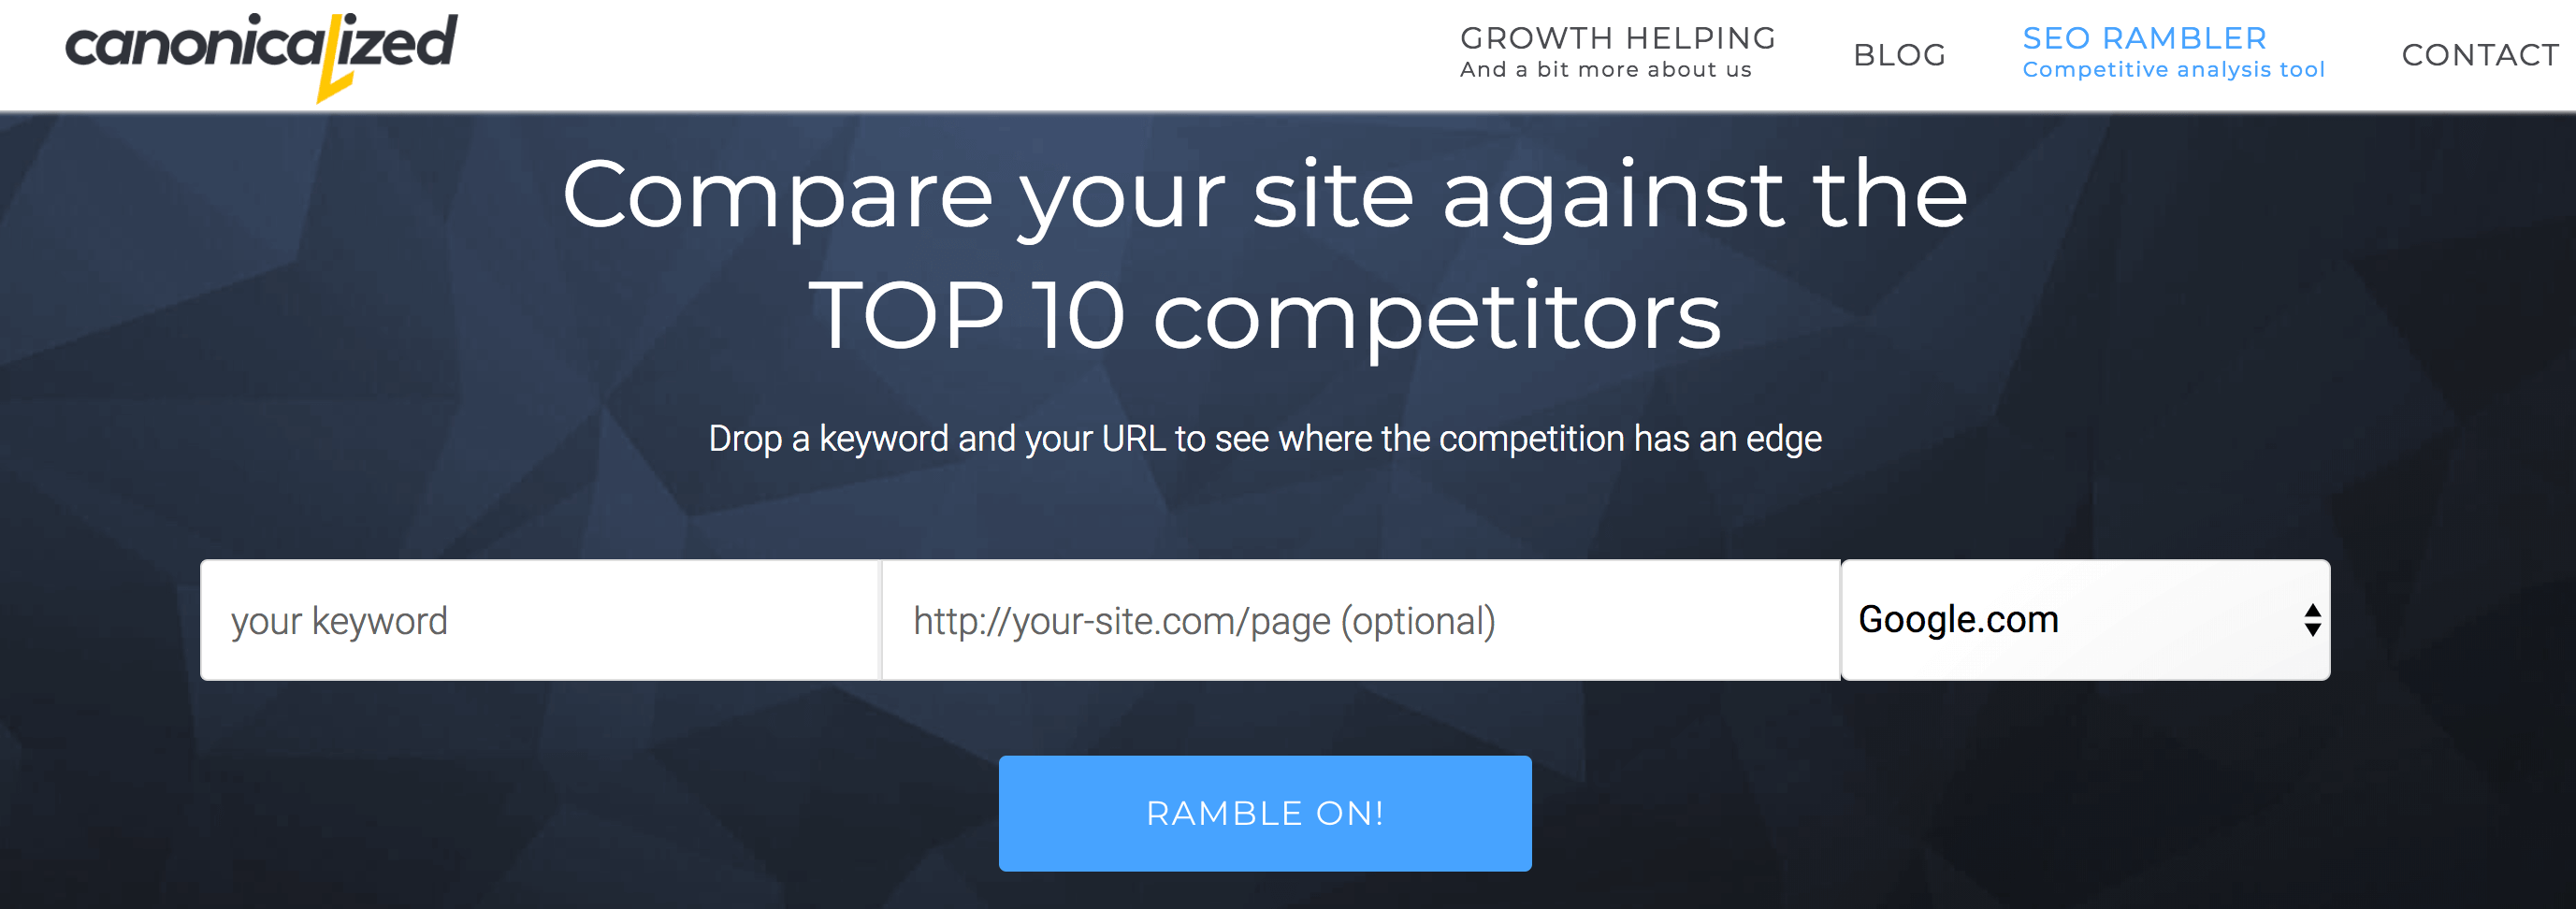 seorambler competitor analysis tools